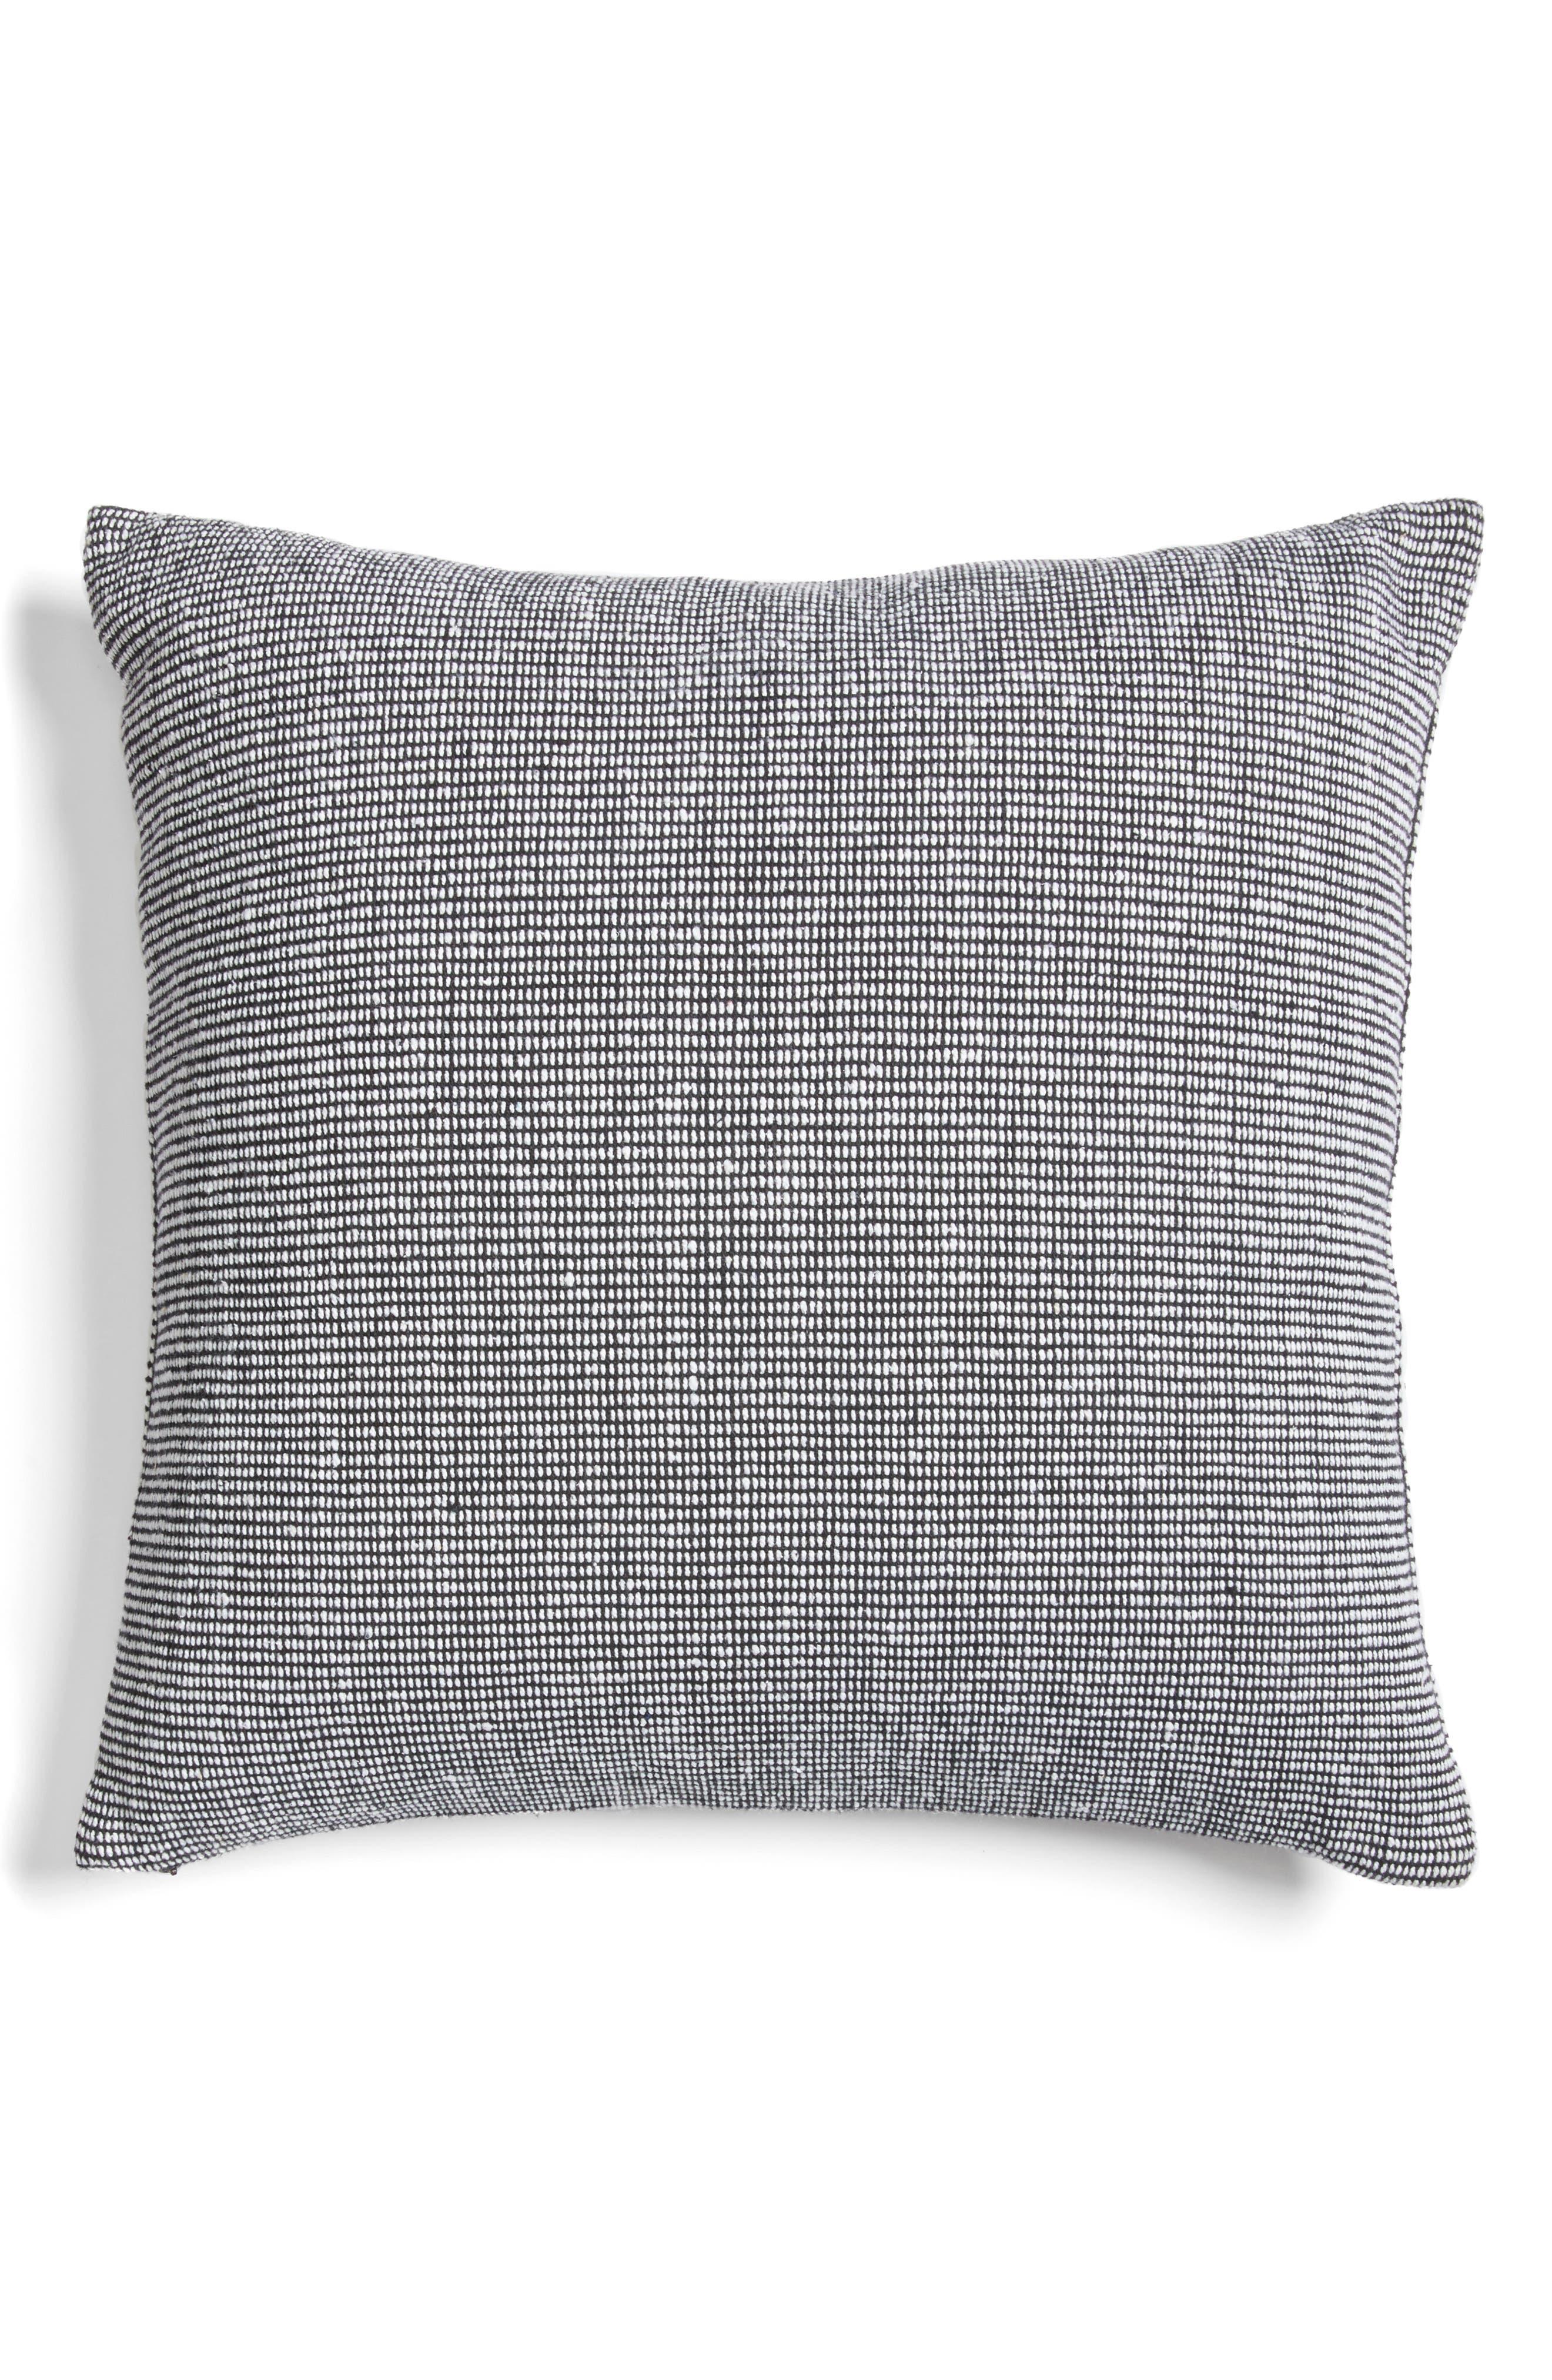 Structure Pillow,                         Main,                         color, BLACK/ WHITE